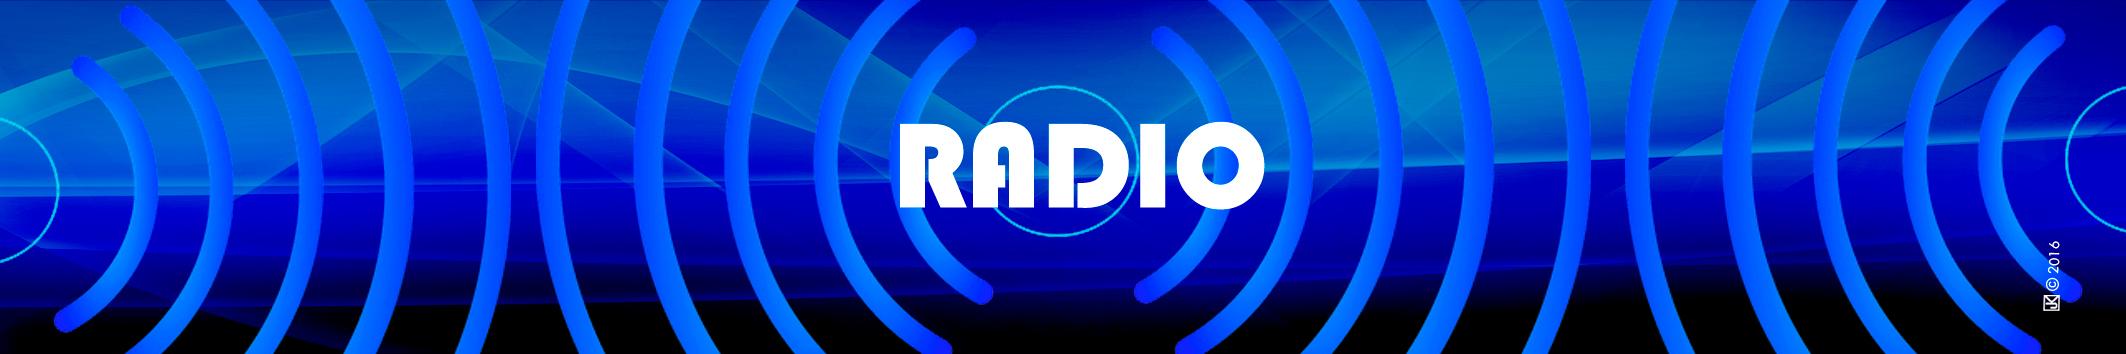 Serge-Krakowski-Radio-Paris-2016